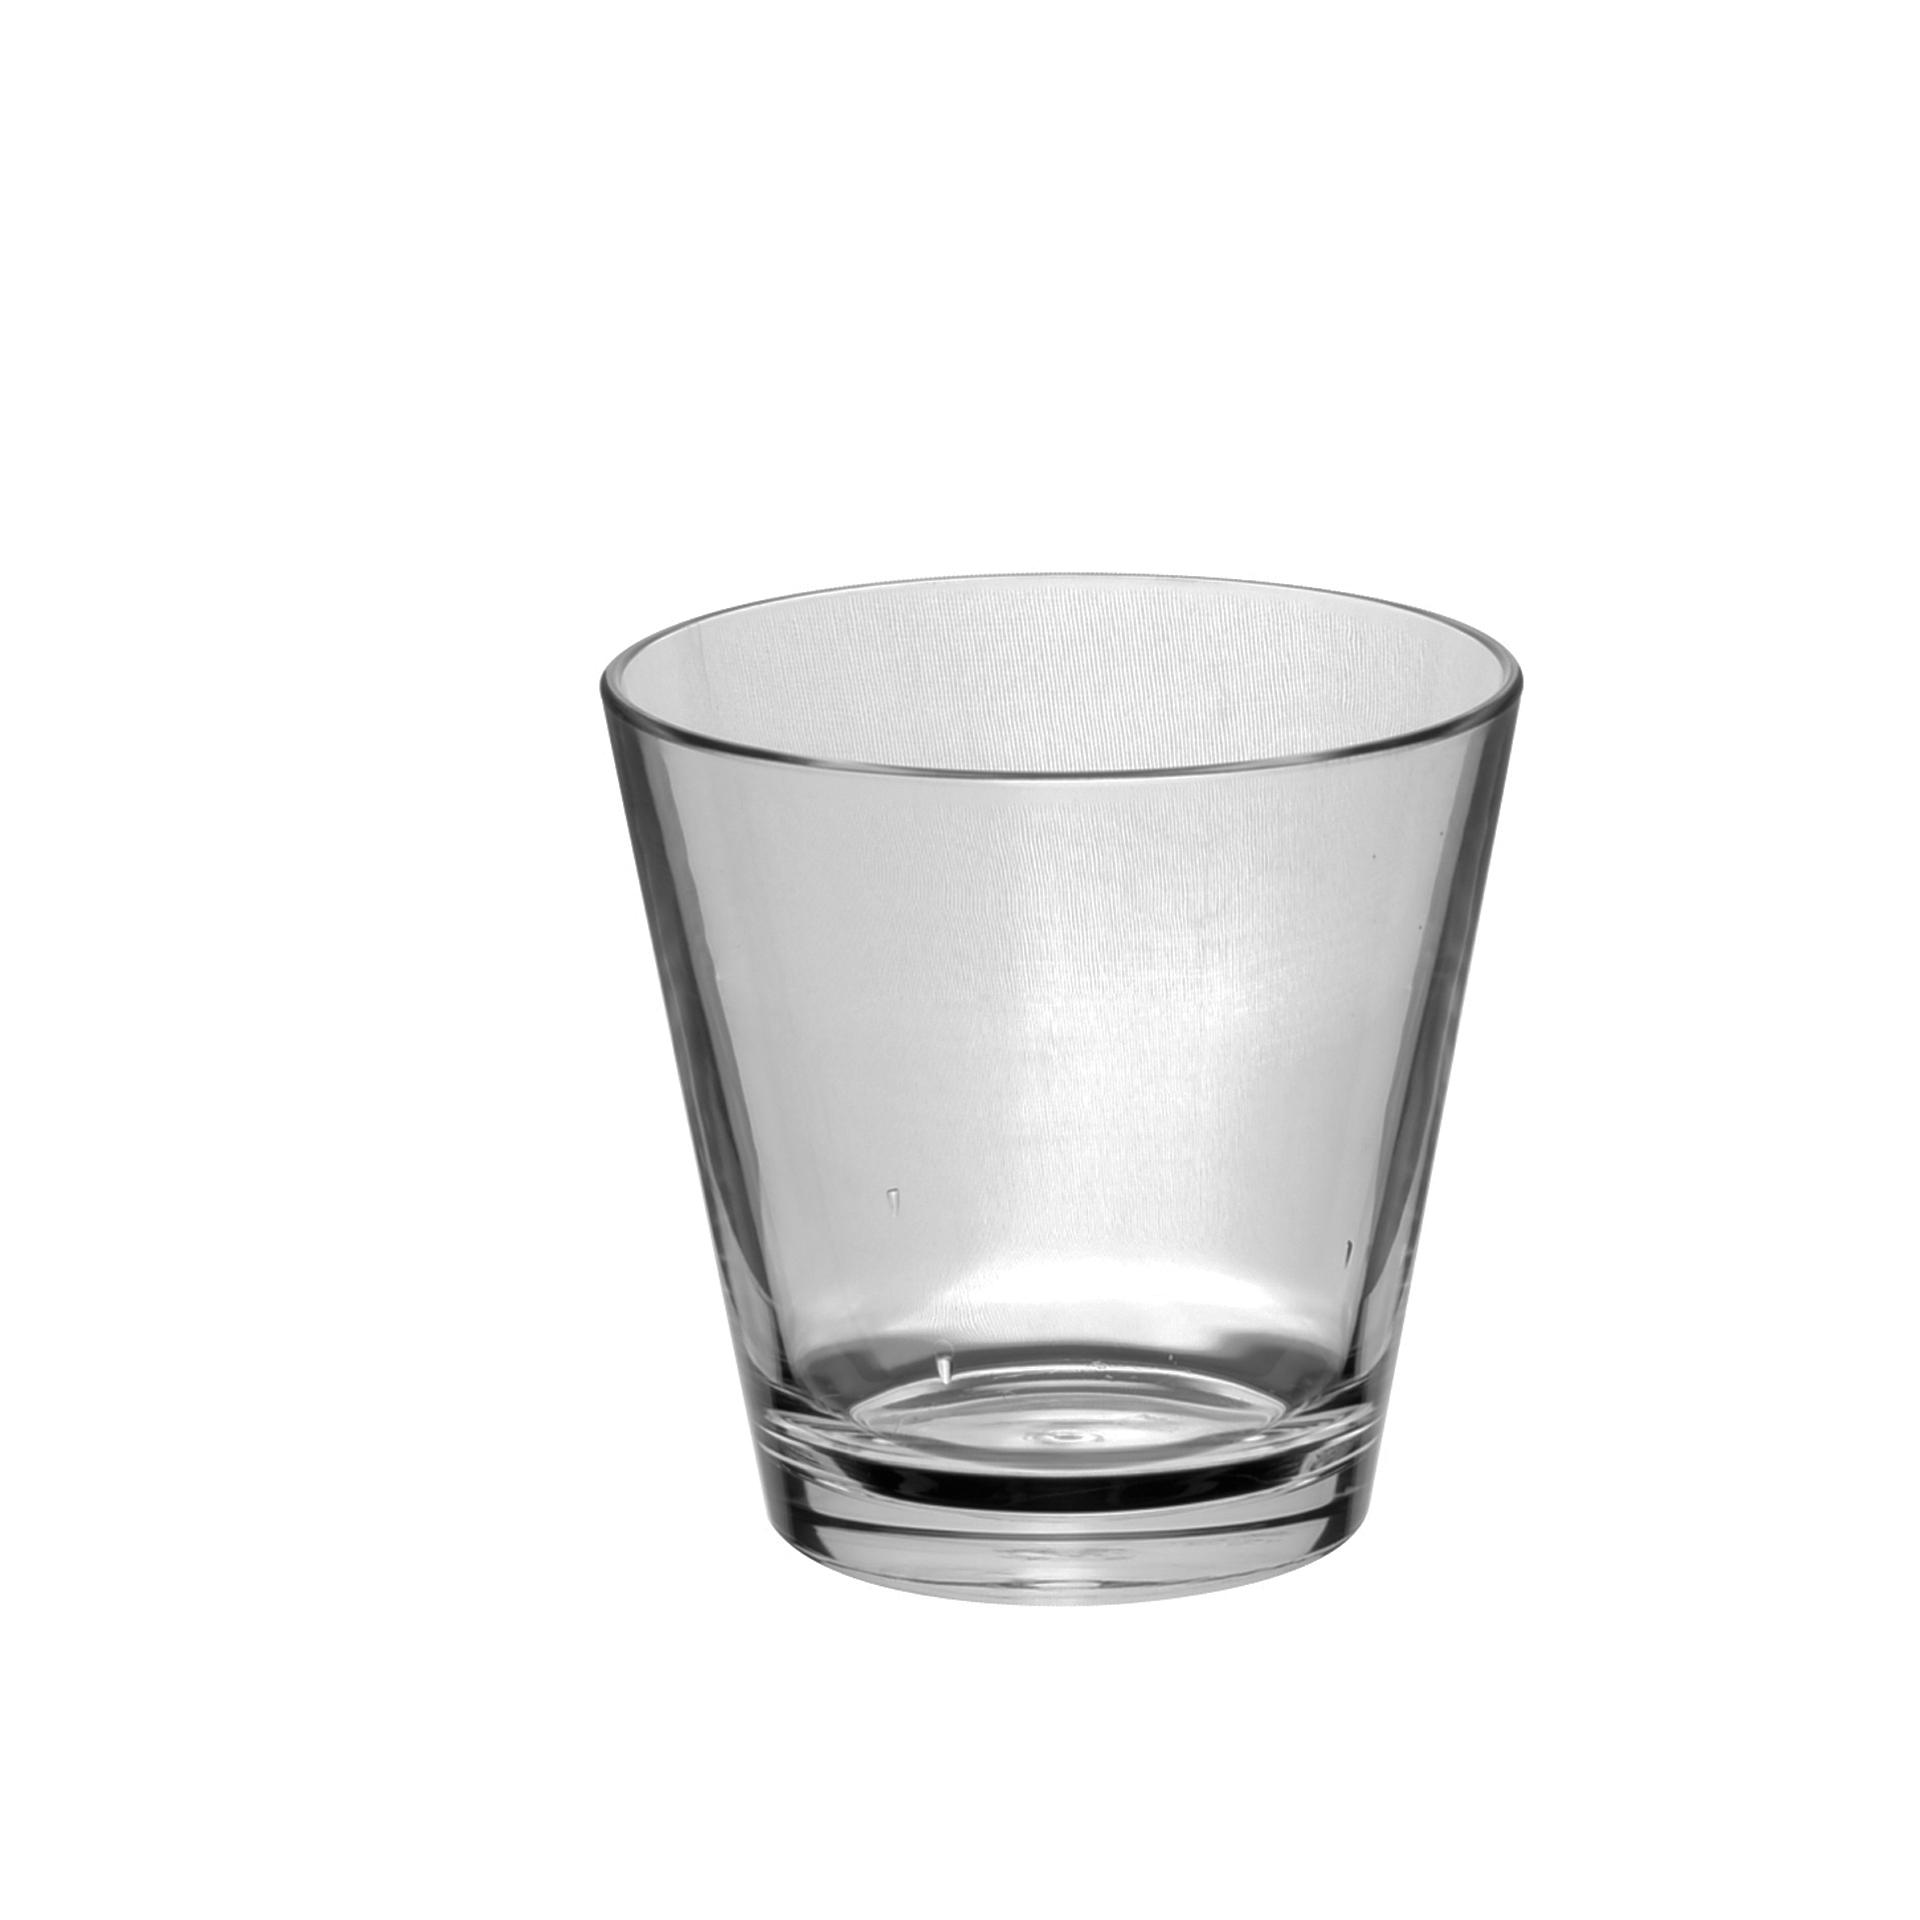 premium polycarbonate whisky glass set 6 tao whisky glasses. Black Bedroom Furniture Sets. Home Design Ideas